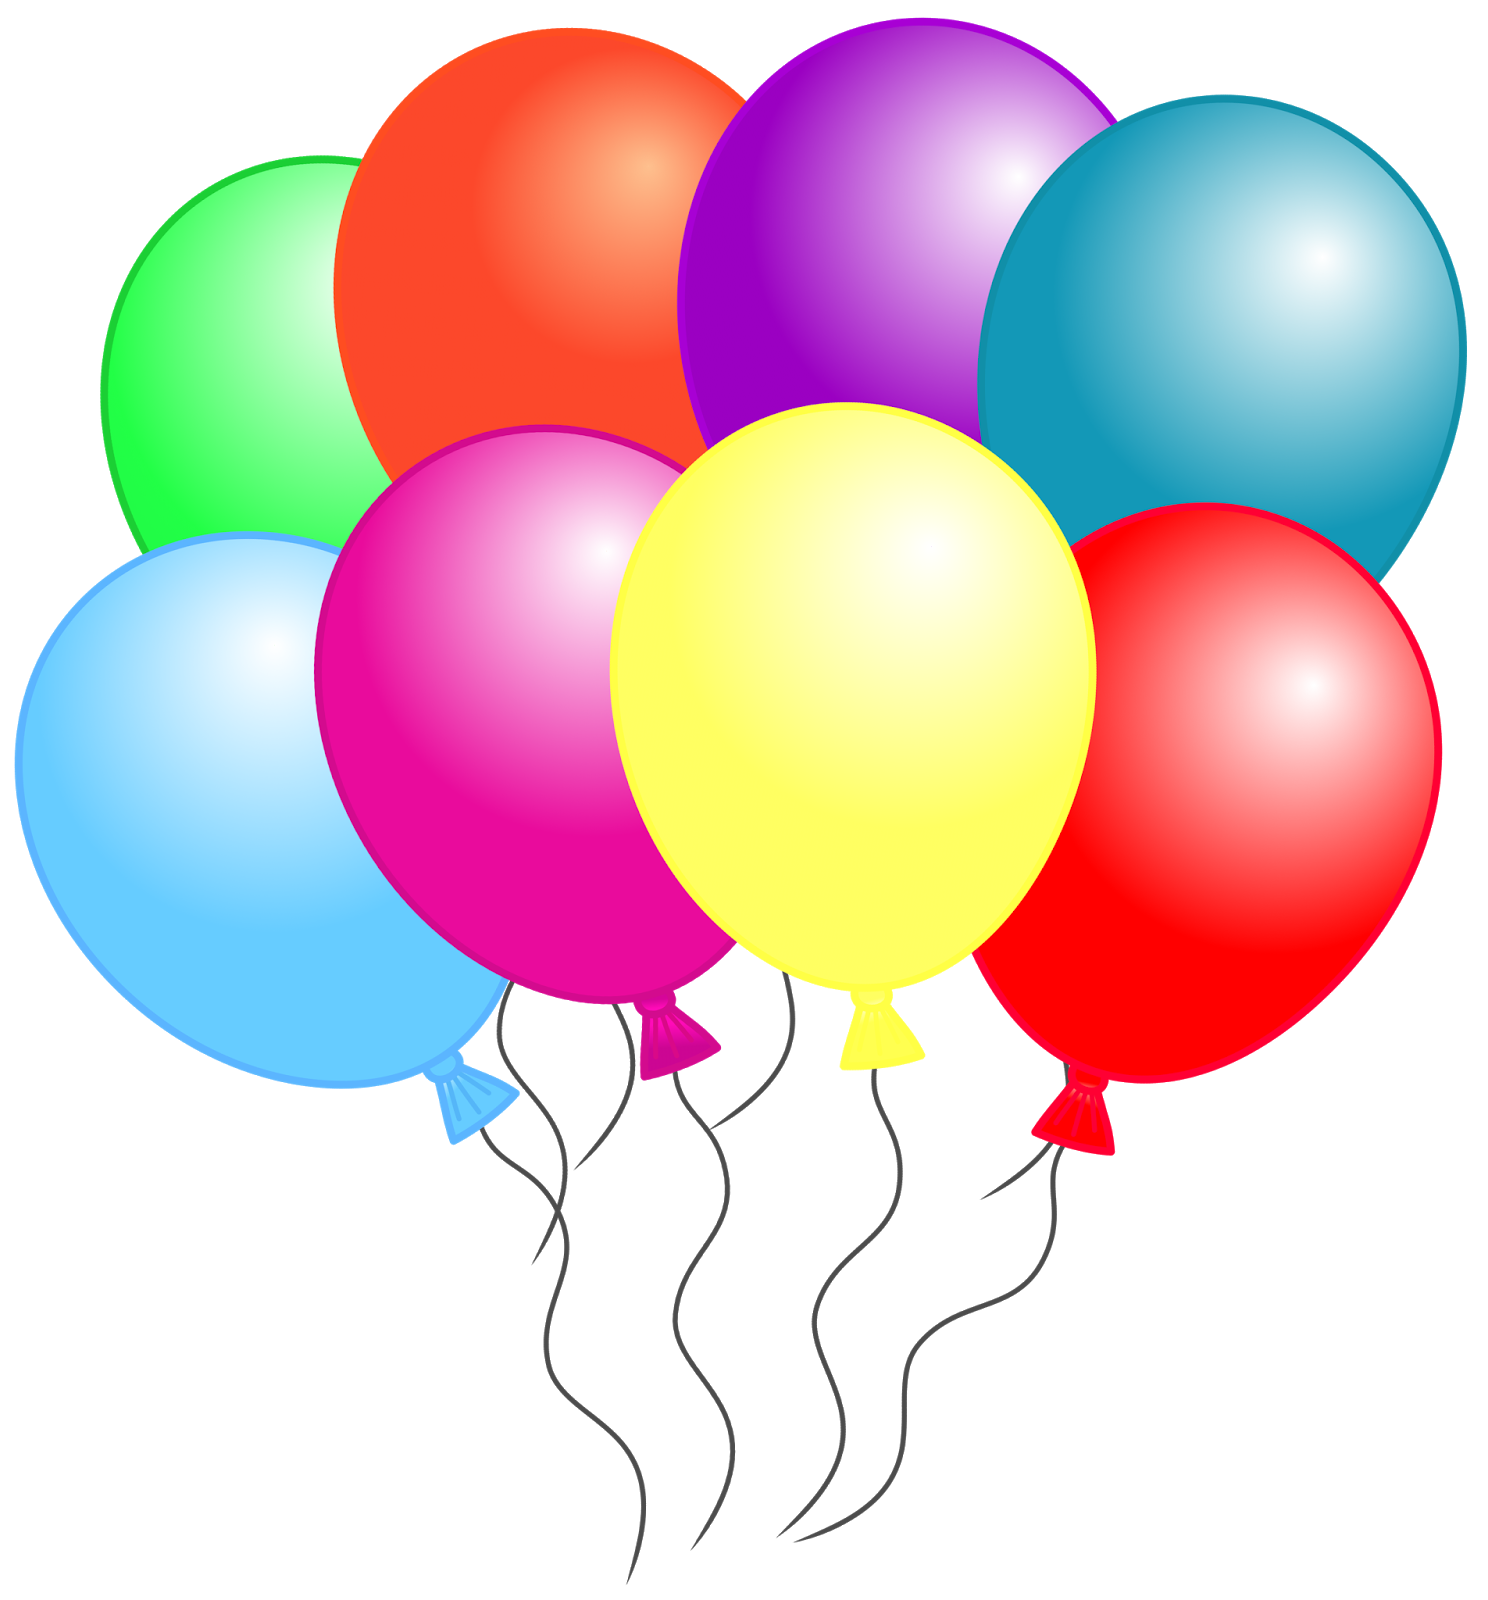 medium resolution of balloon clipart classroom clipart birthday balloons a3 cricket bulletin boards